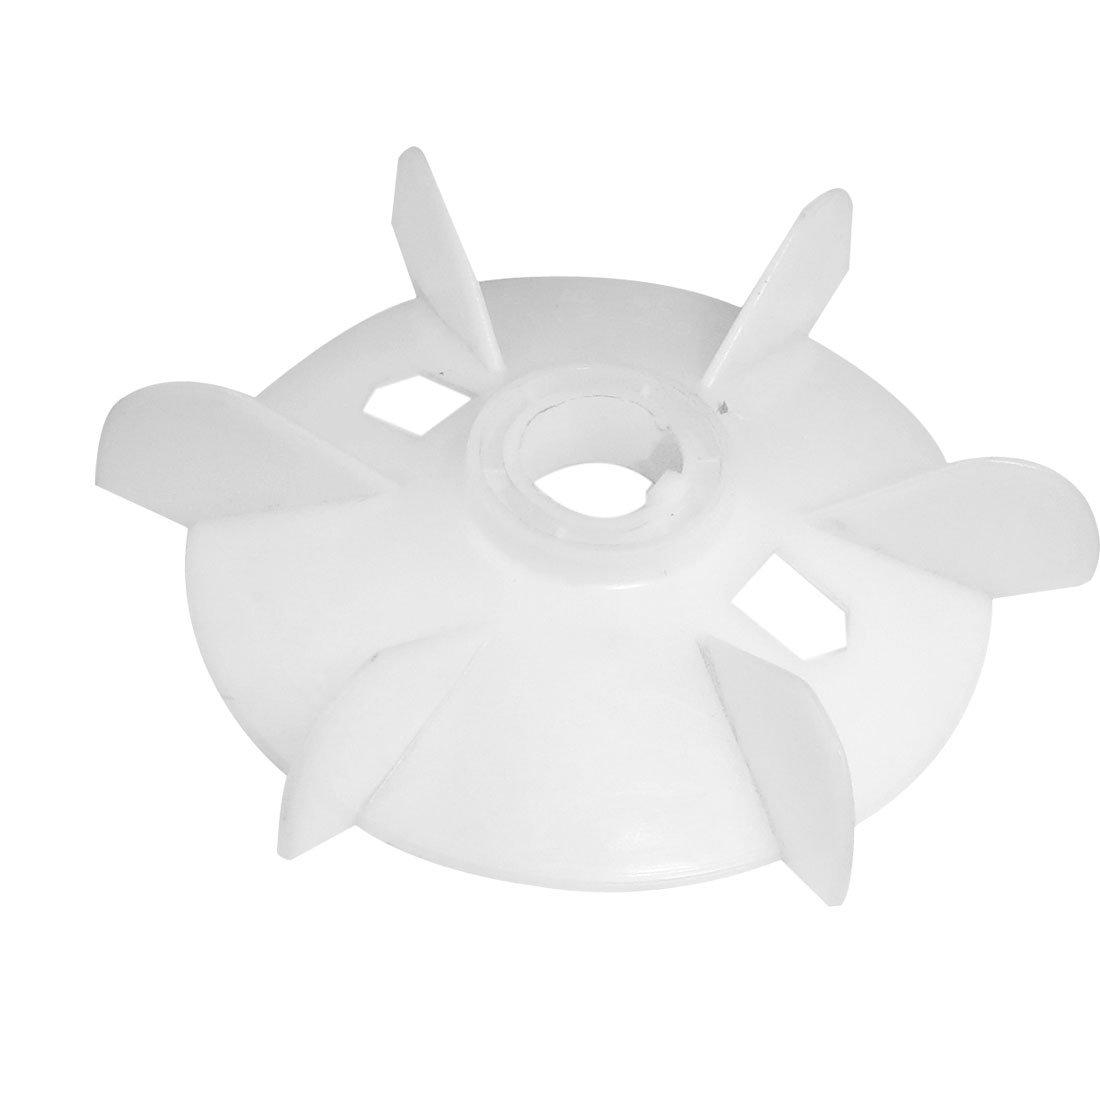 uxcell Spare Part 28mm Inner Dia 6 Vanes Impeller Plastic Motor Fan Wheel